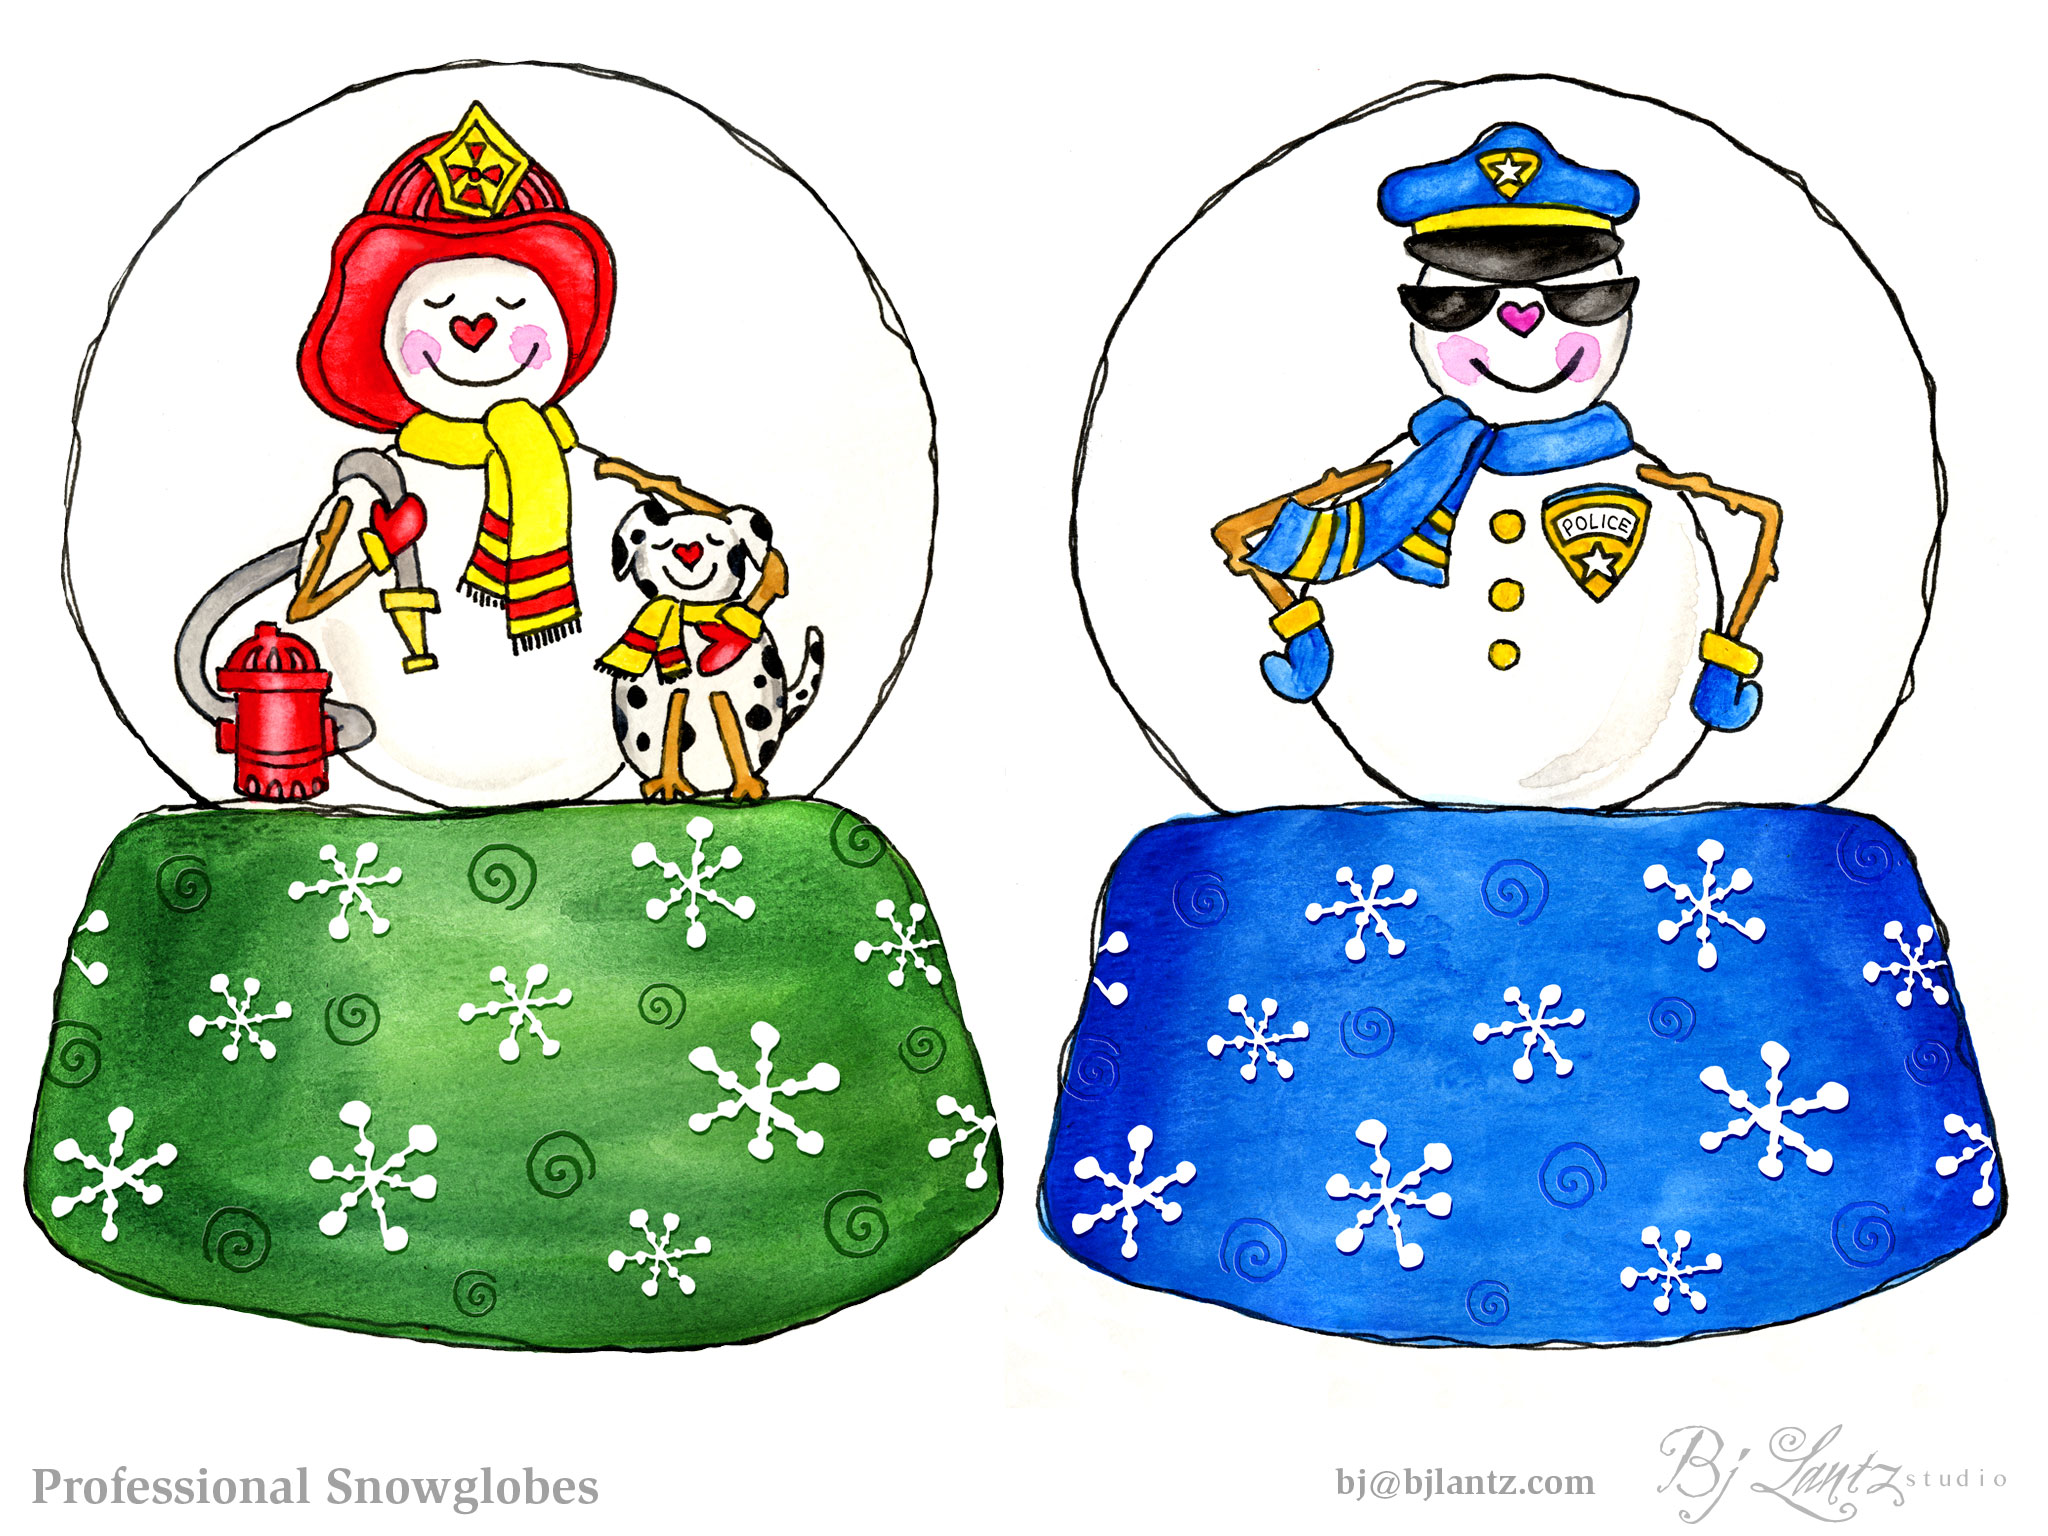 Snowglobes_pros_portfolio_2.jpg